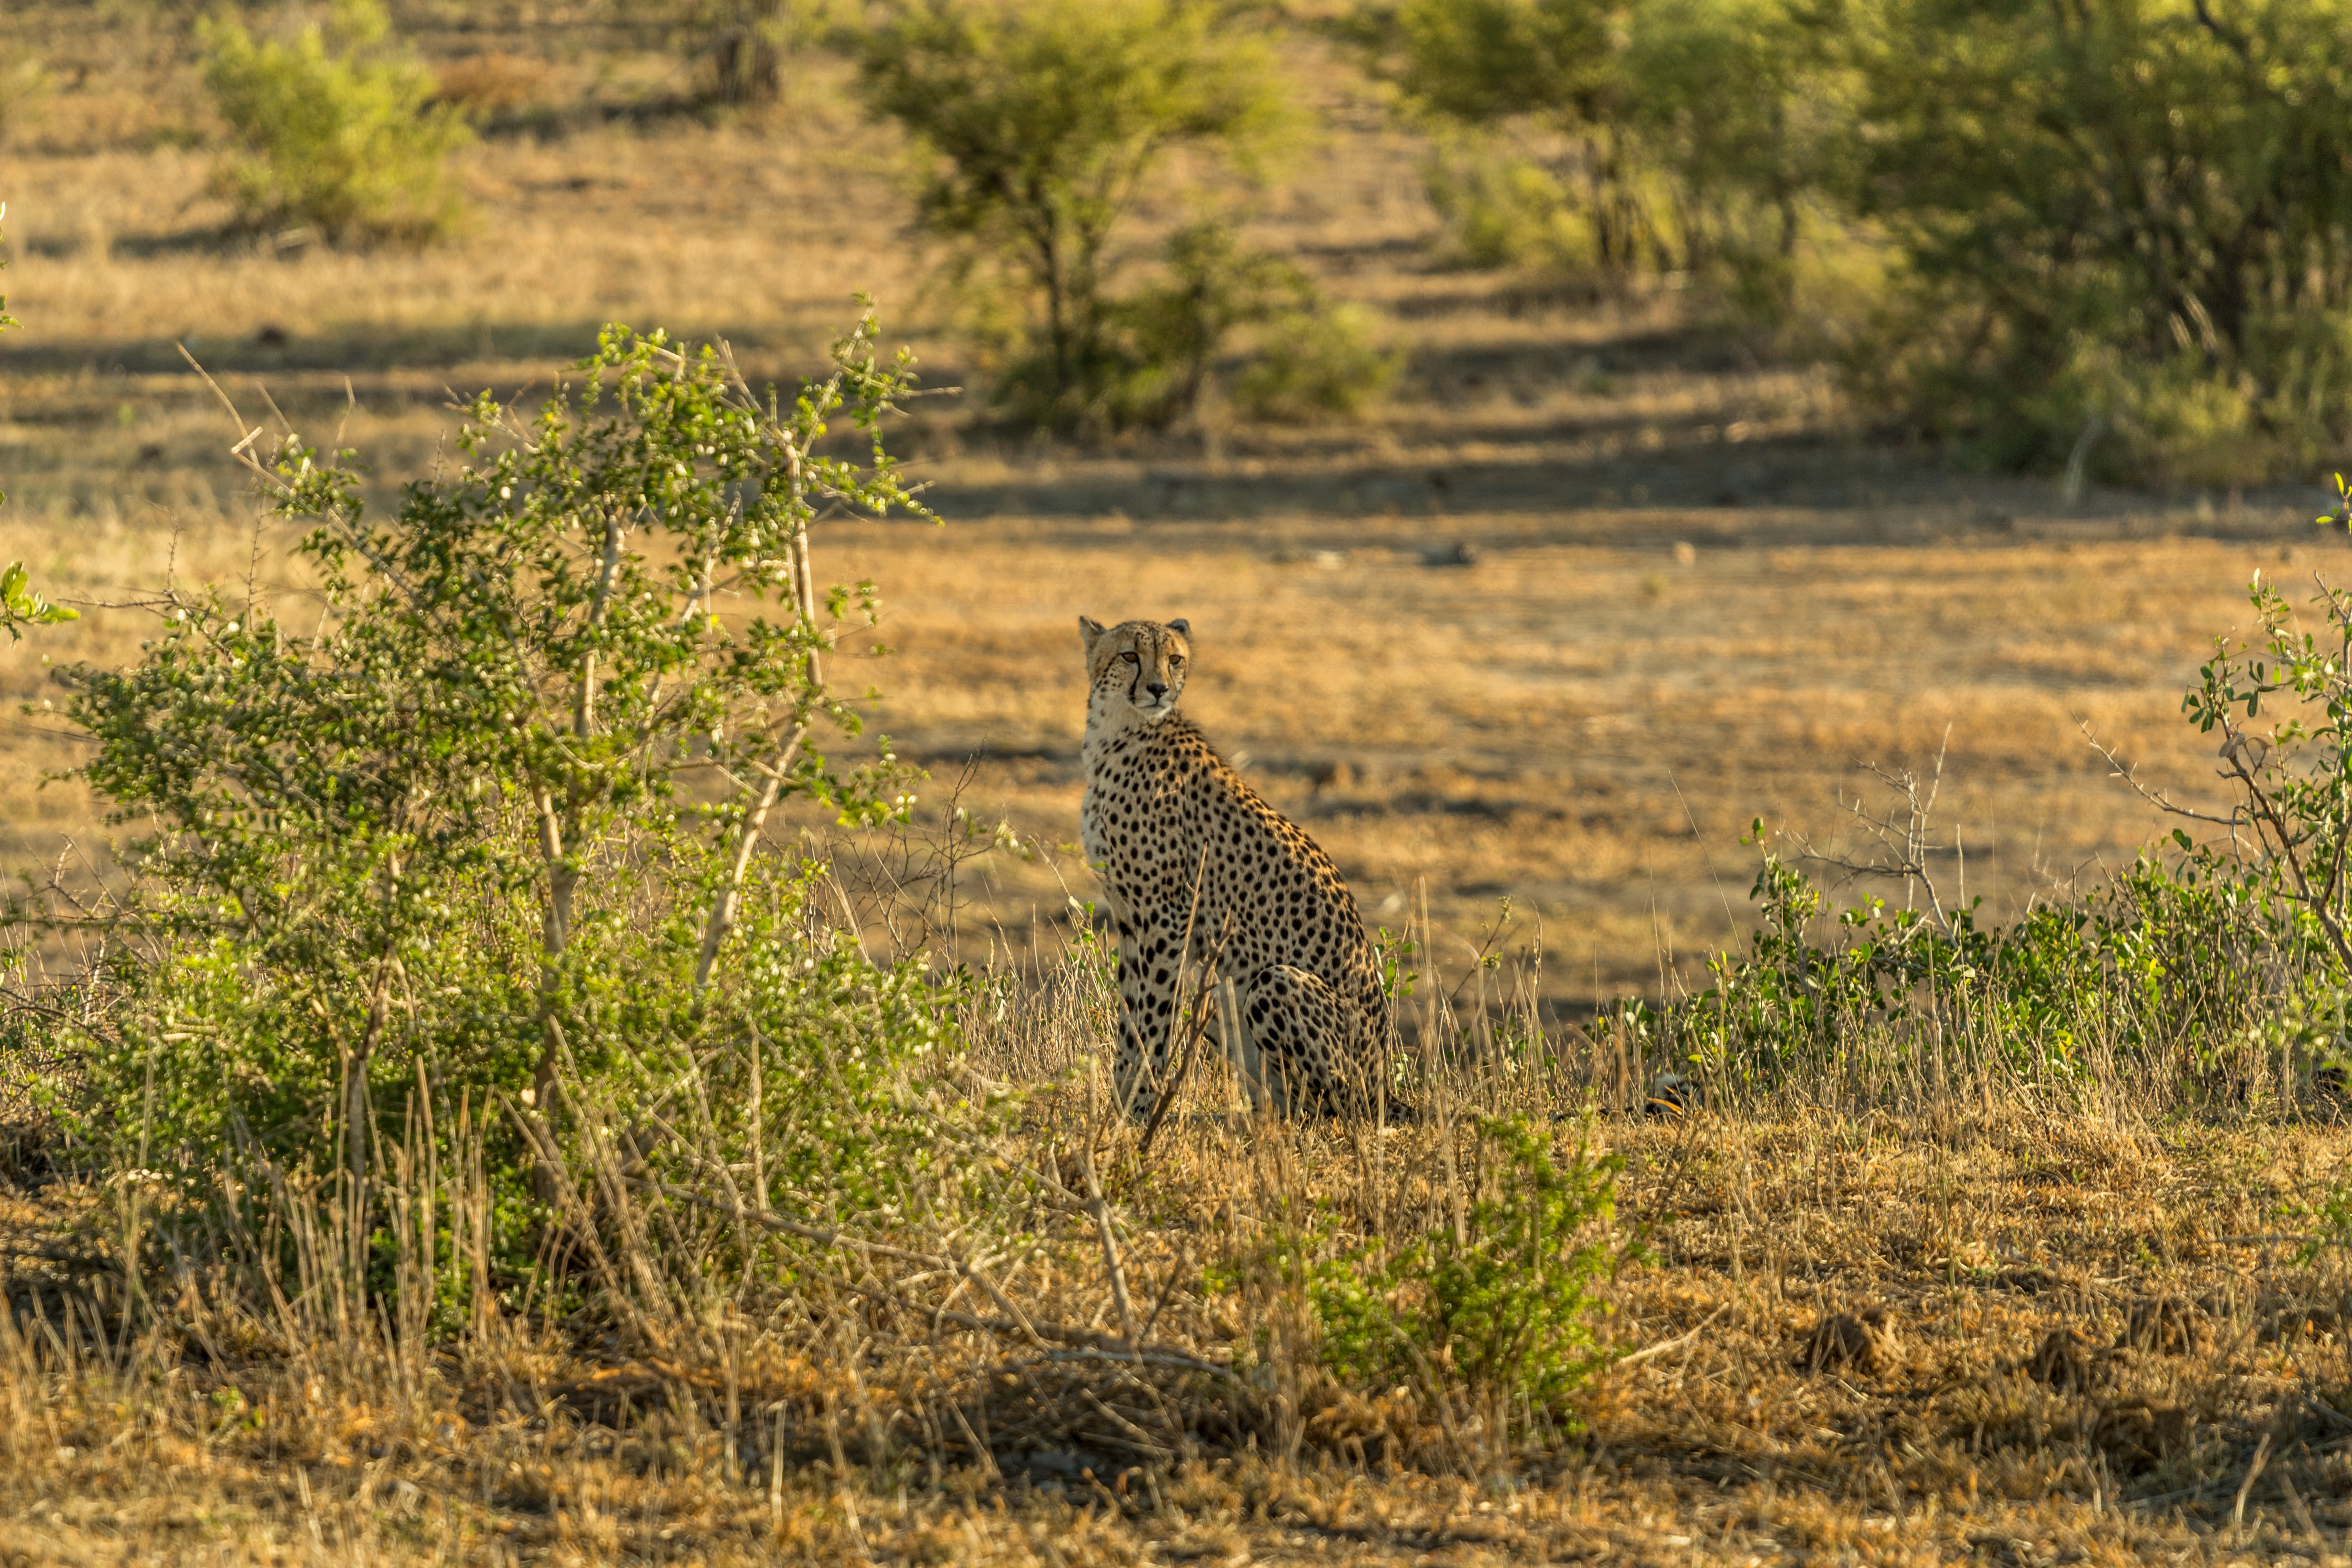 cheetah sitting next to grasses